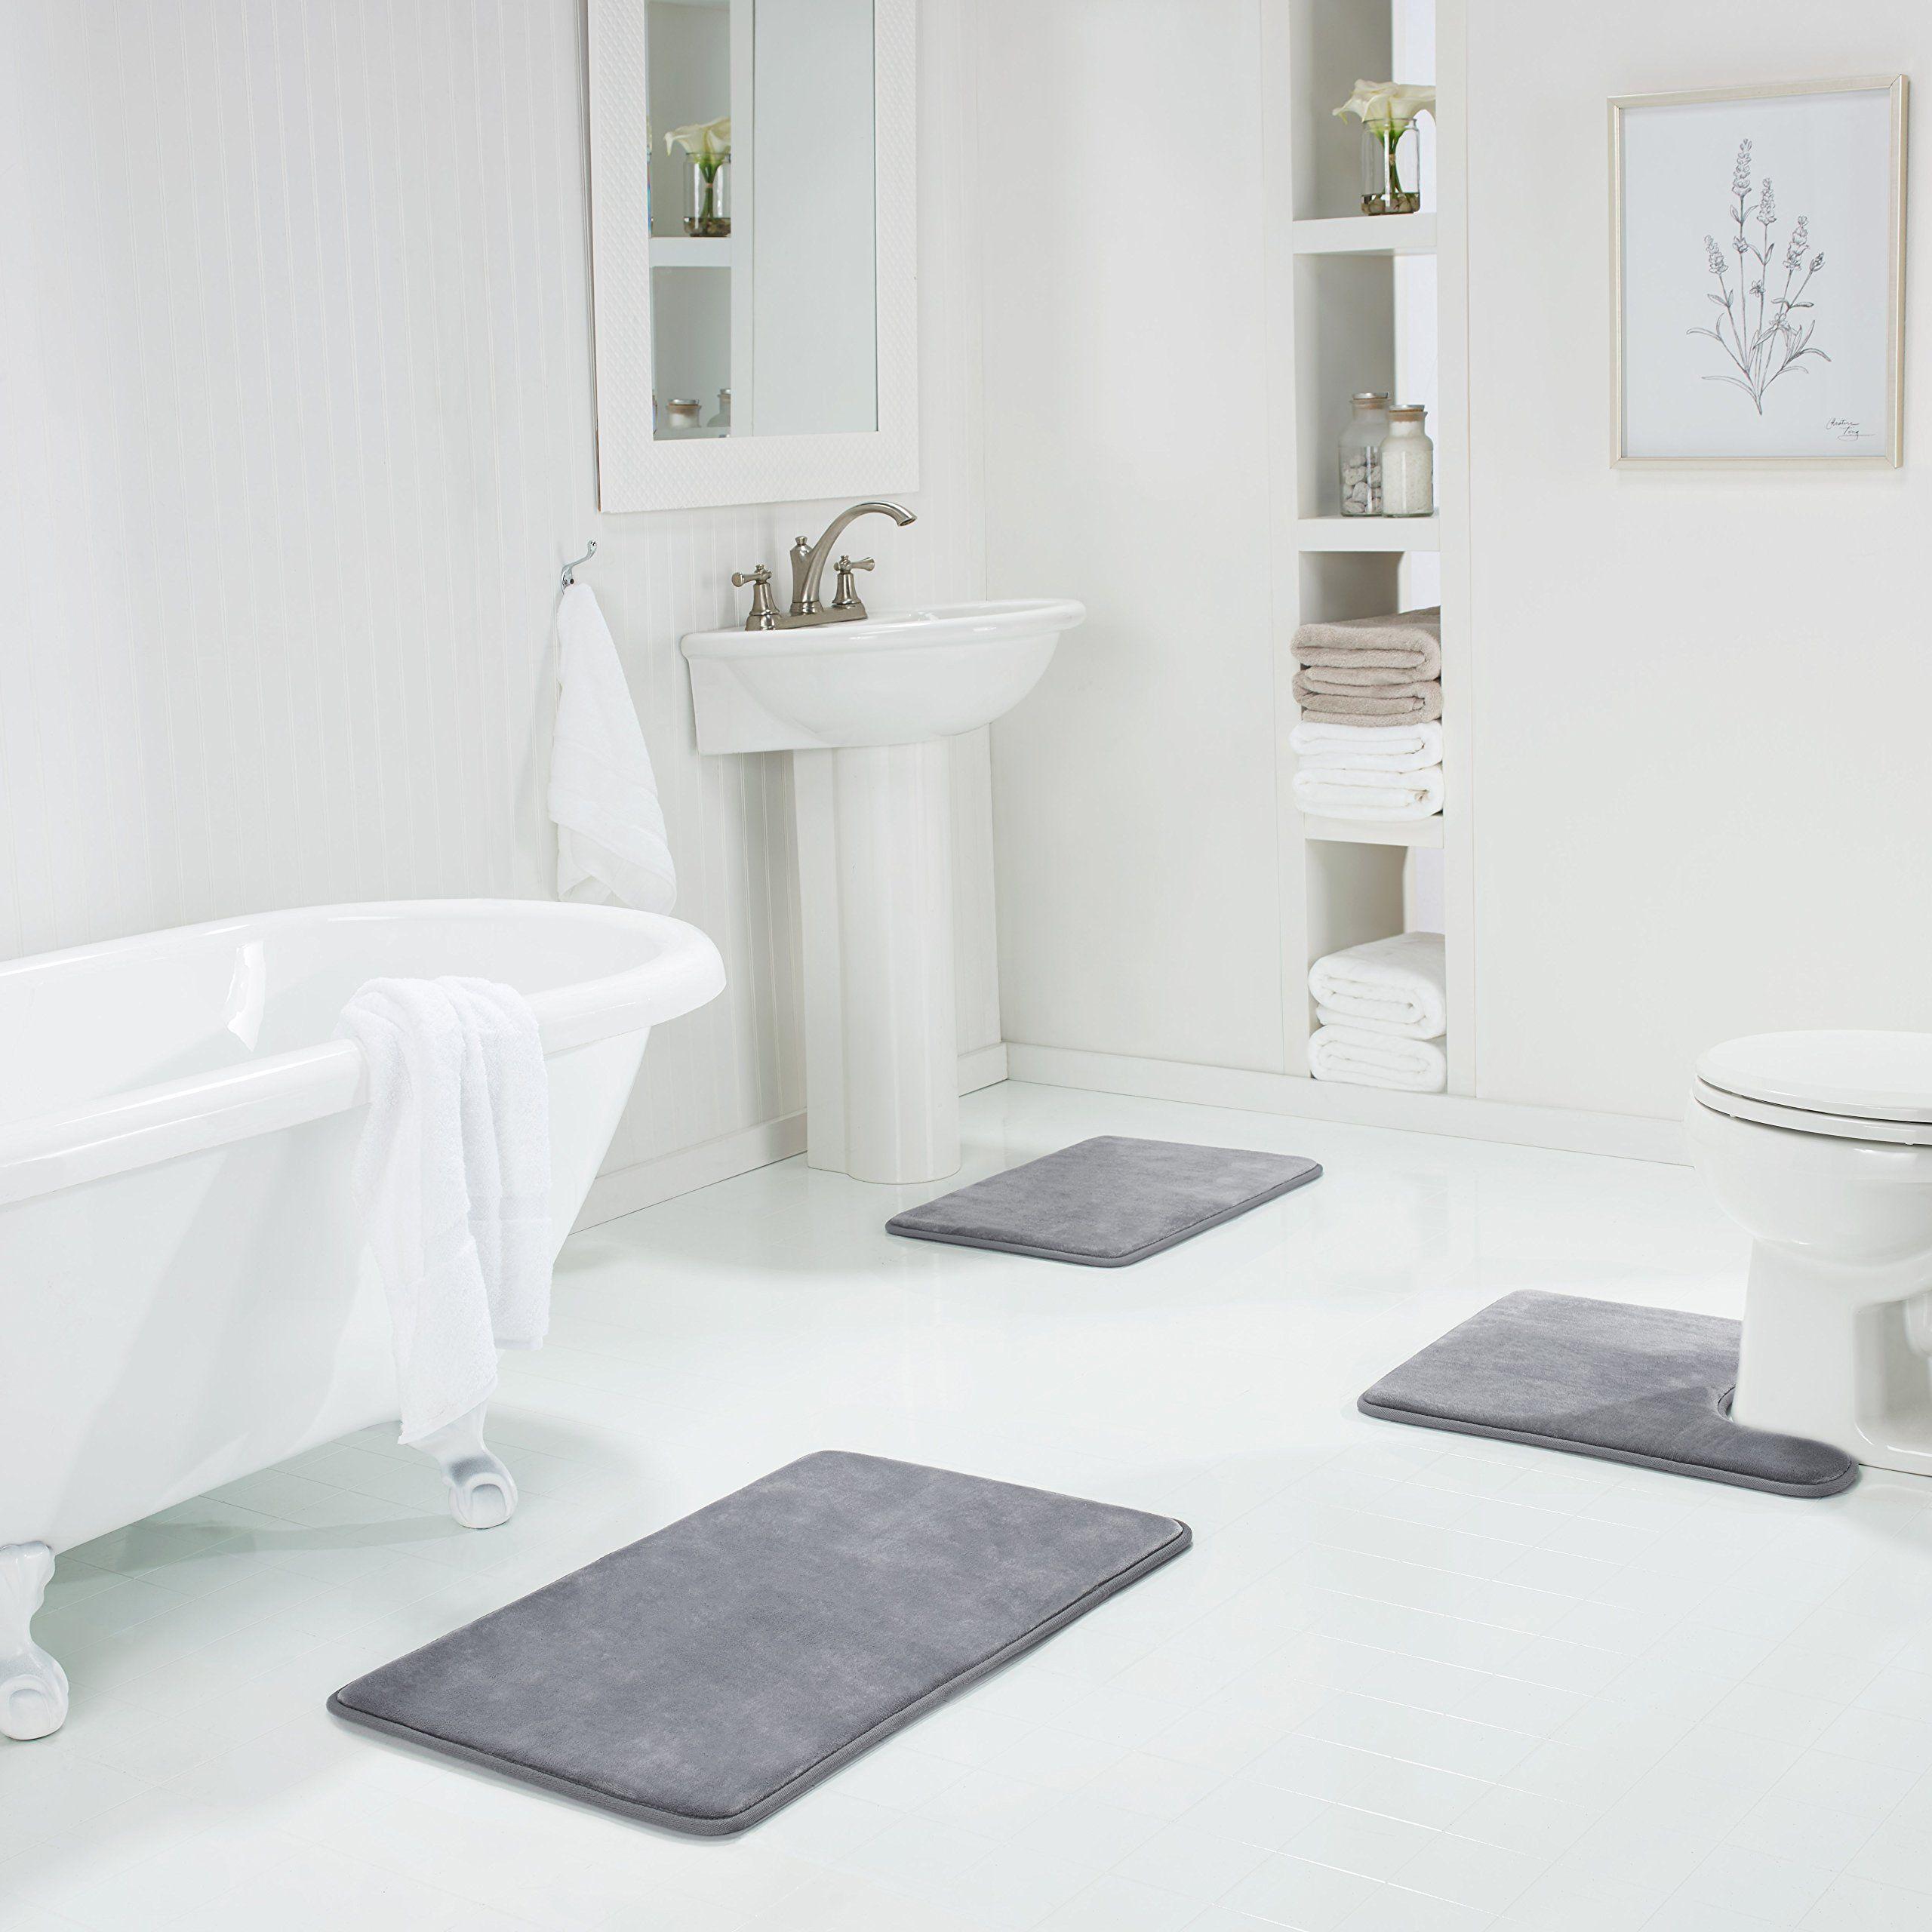 Bath Mats Non Skid For Tub For Kids Mildew Resistant Microfiber Noodle Bathroom Rugs Blue Machine Washable 31 5 Bathroom Rugs Shaggy Bath Rugs Rugs On Carpet